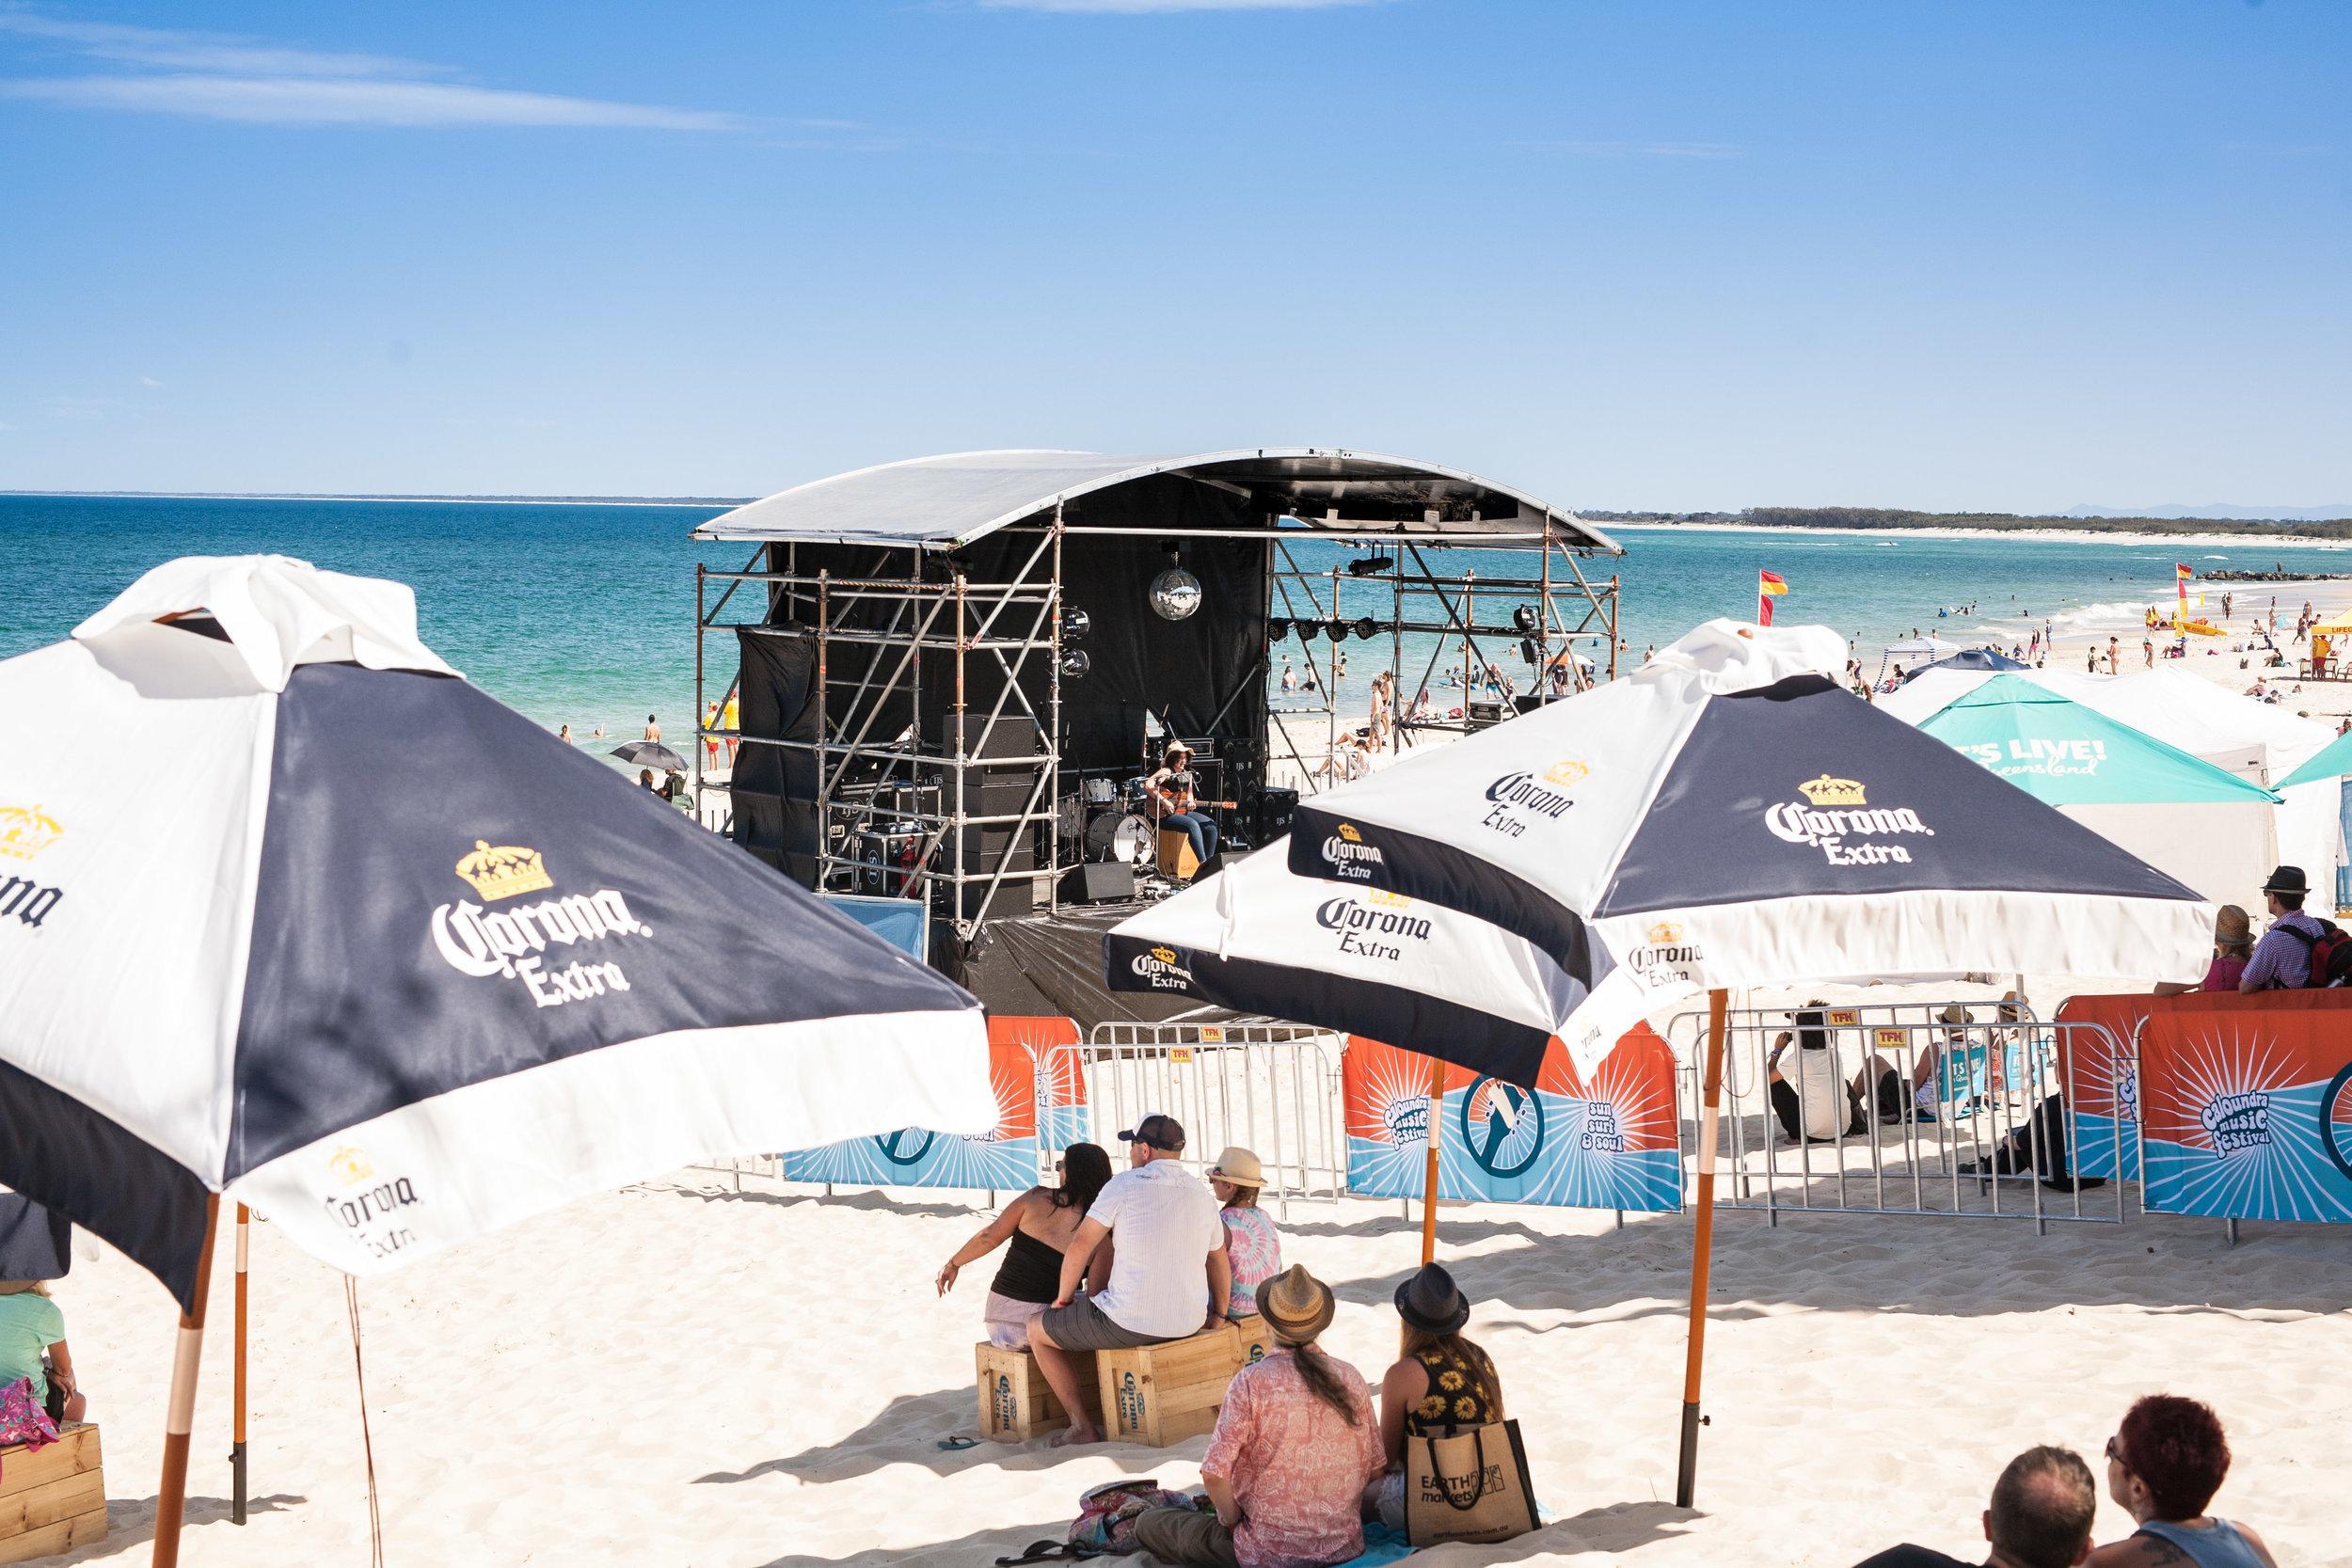 sand-stage-crowd-cynthialee.jpg